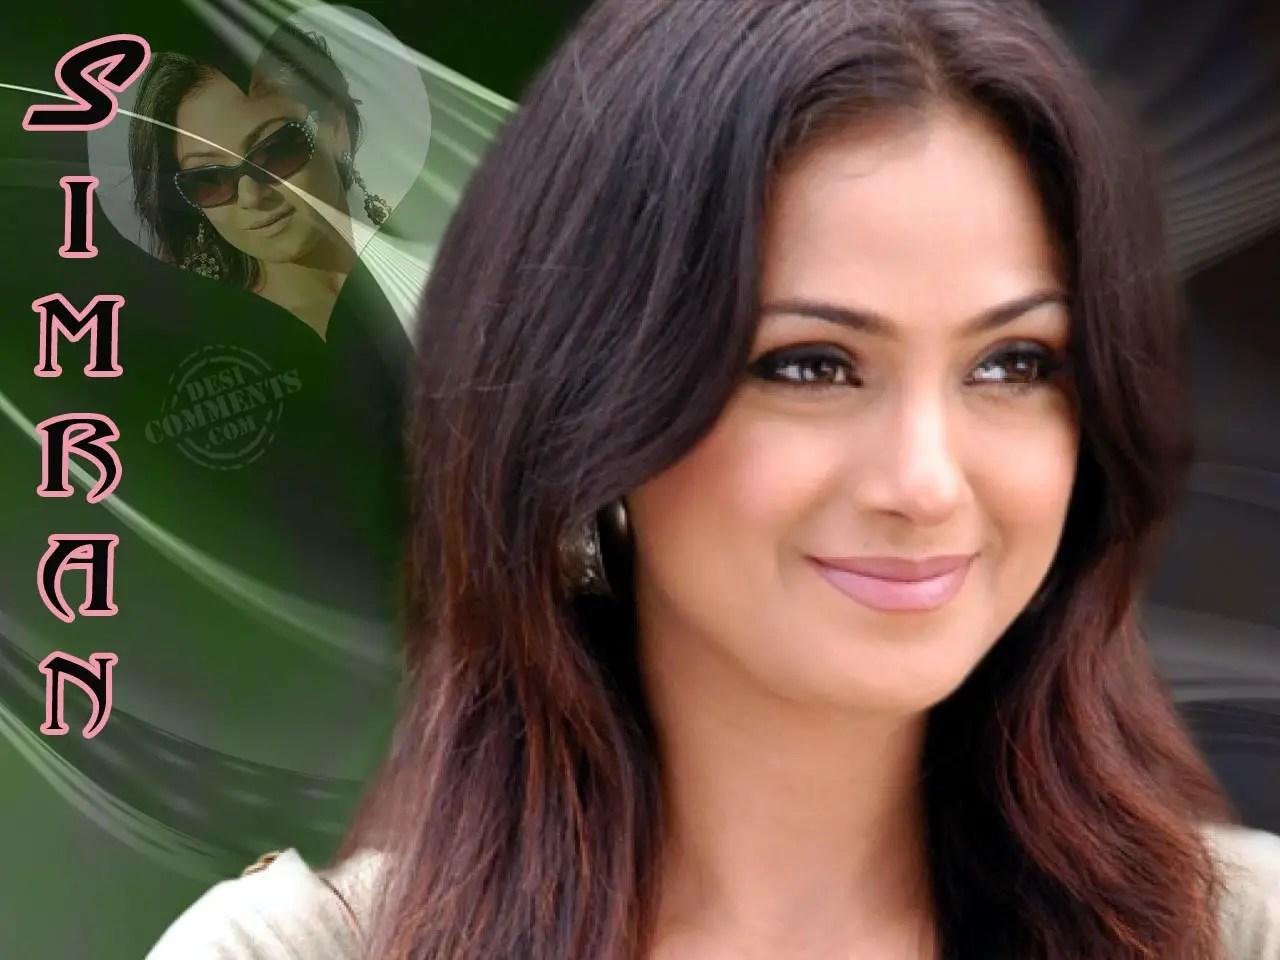 Beautiful Girl With Gun Wallpaper Simran Wallpapers South Indian Celebrities